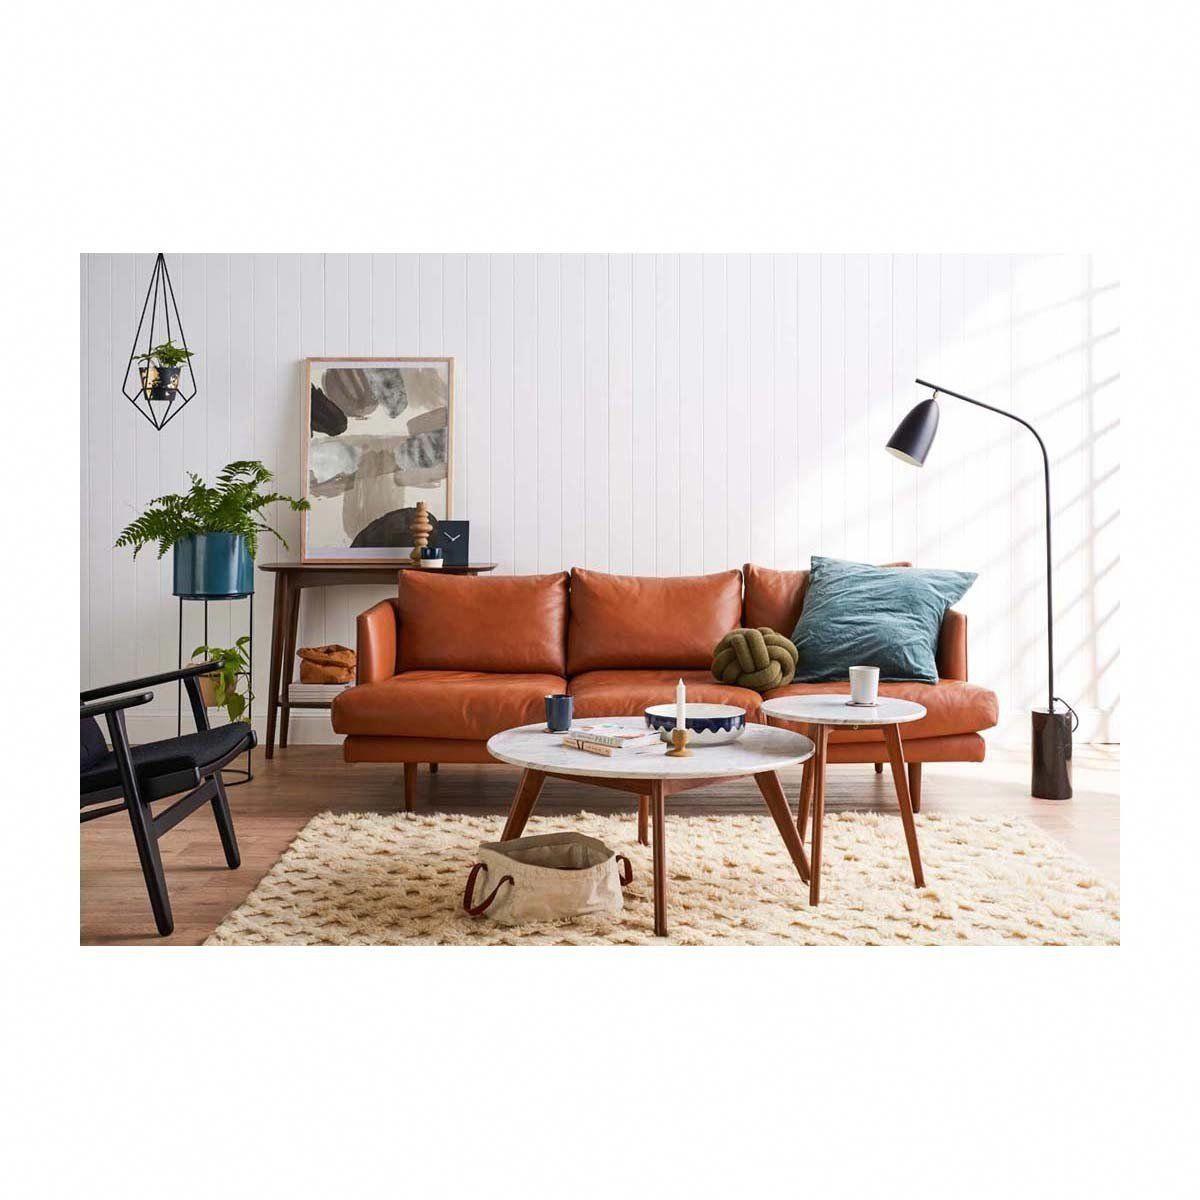 Life interiors carl 3 seater leather sofa tan modern sofas buy your furniture online or in store buyfurnitureonline